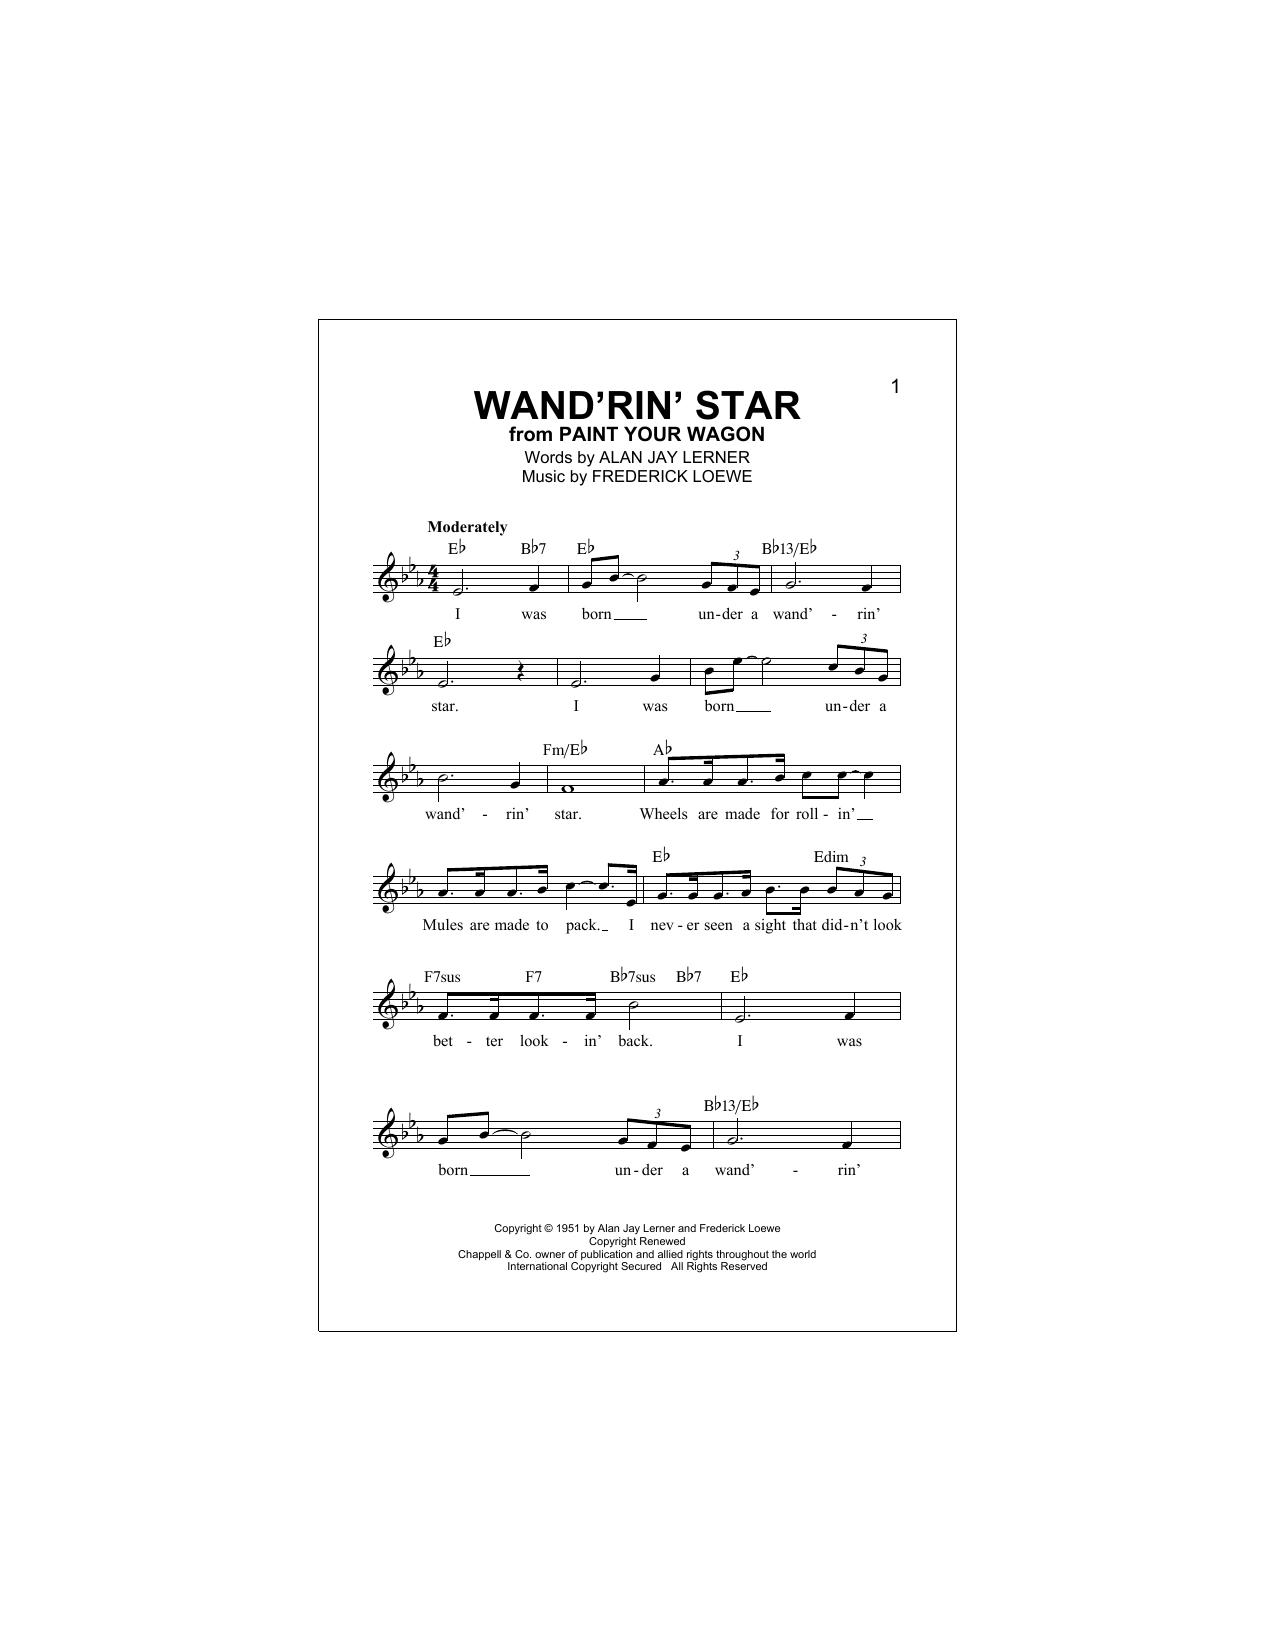 Alan Jay Lerner Wand'rin' Star sheet music notes and chords. Download Printable PDF.